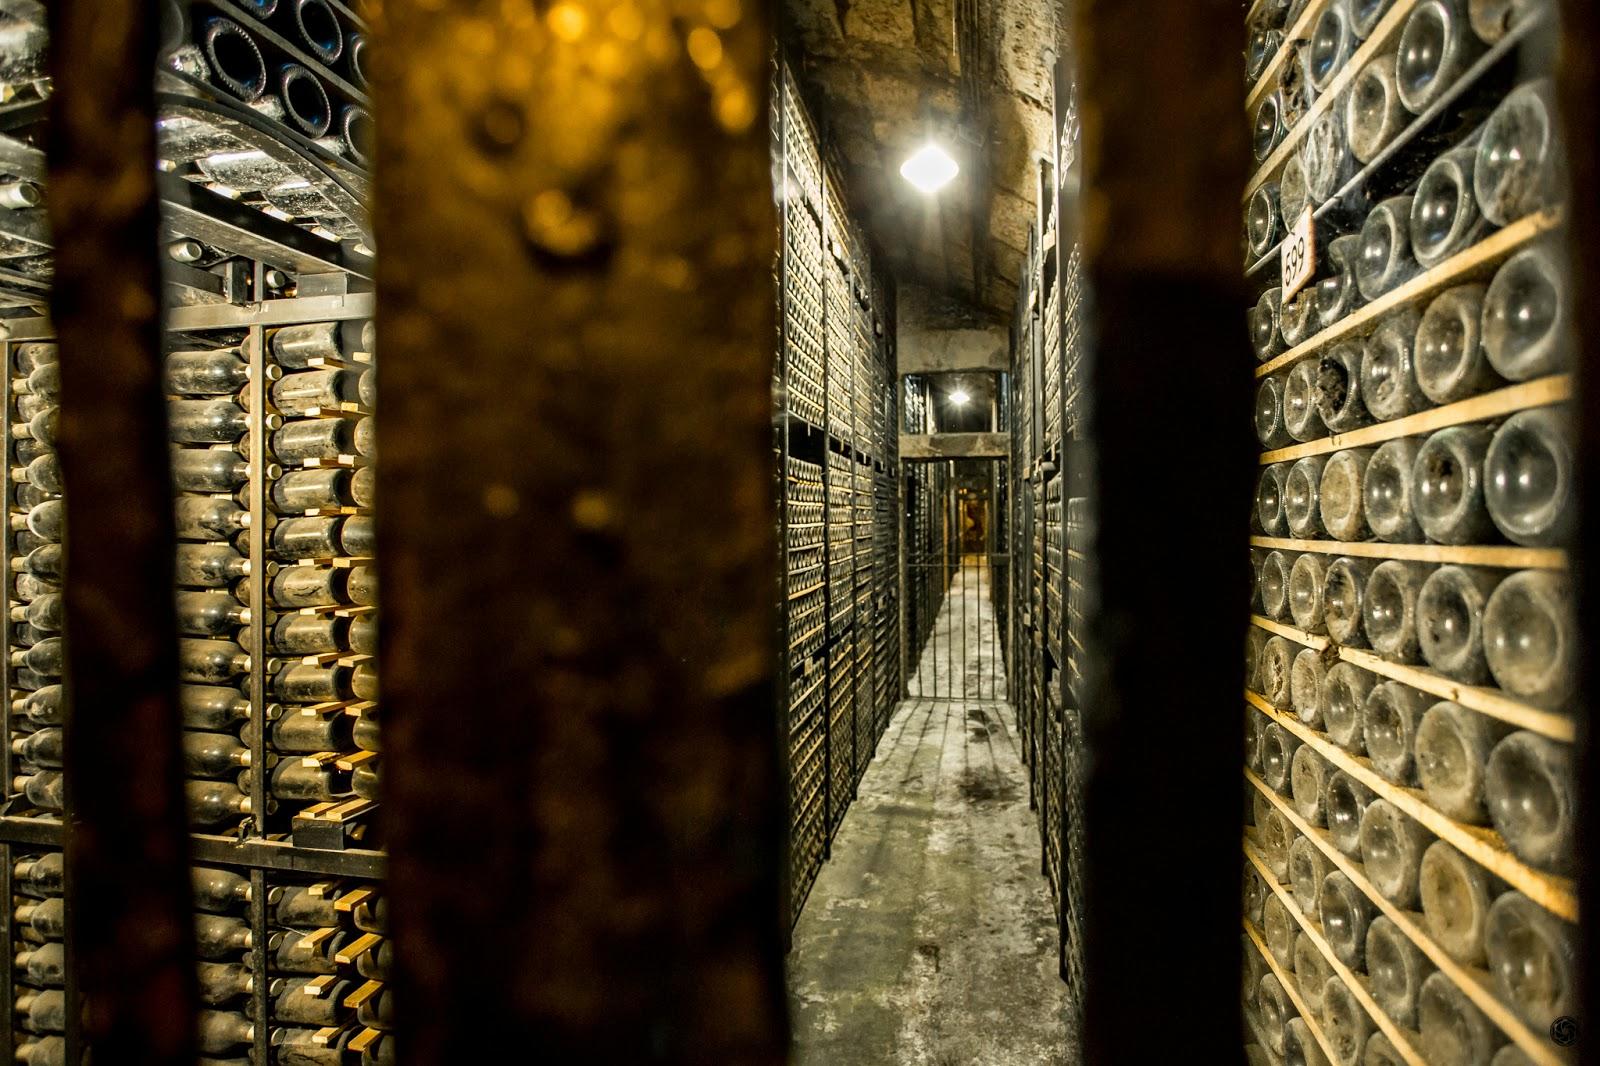 Botellería, mausoleo :: Canon EOS 5D MkIII | ISO6400 | Canon 17-40 @17mm | f/4.0 | 1/25s